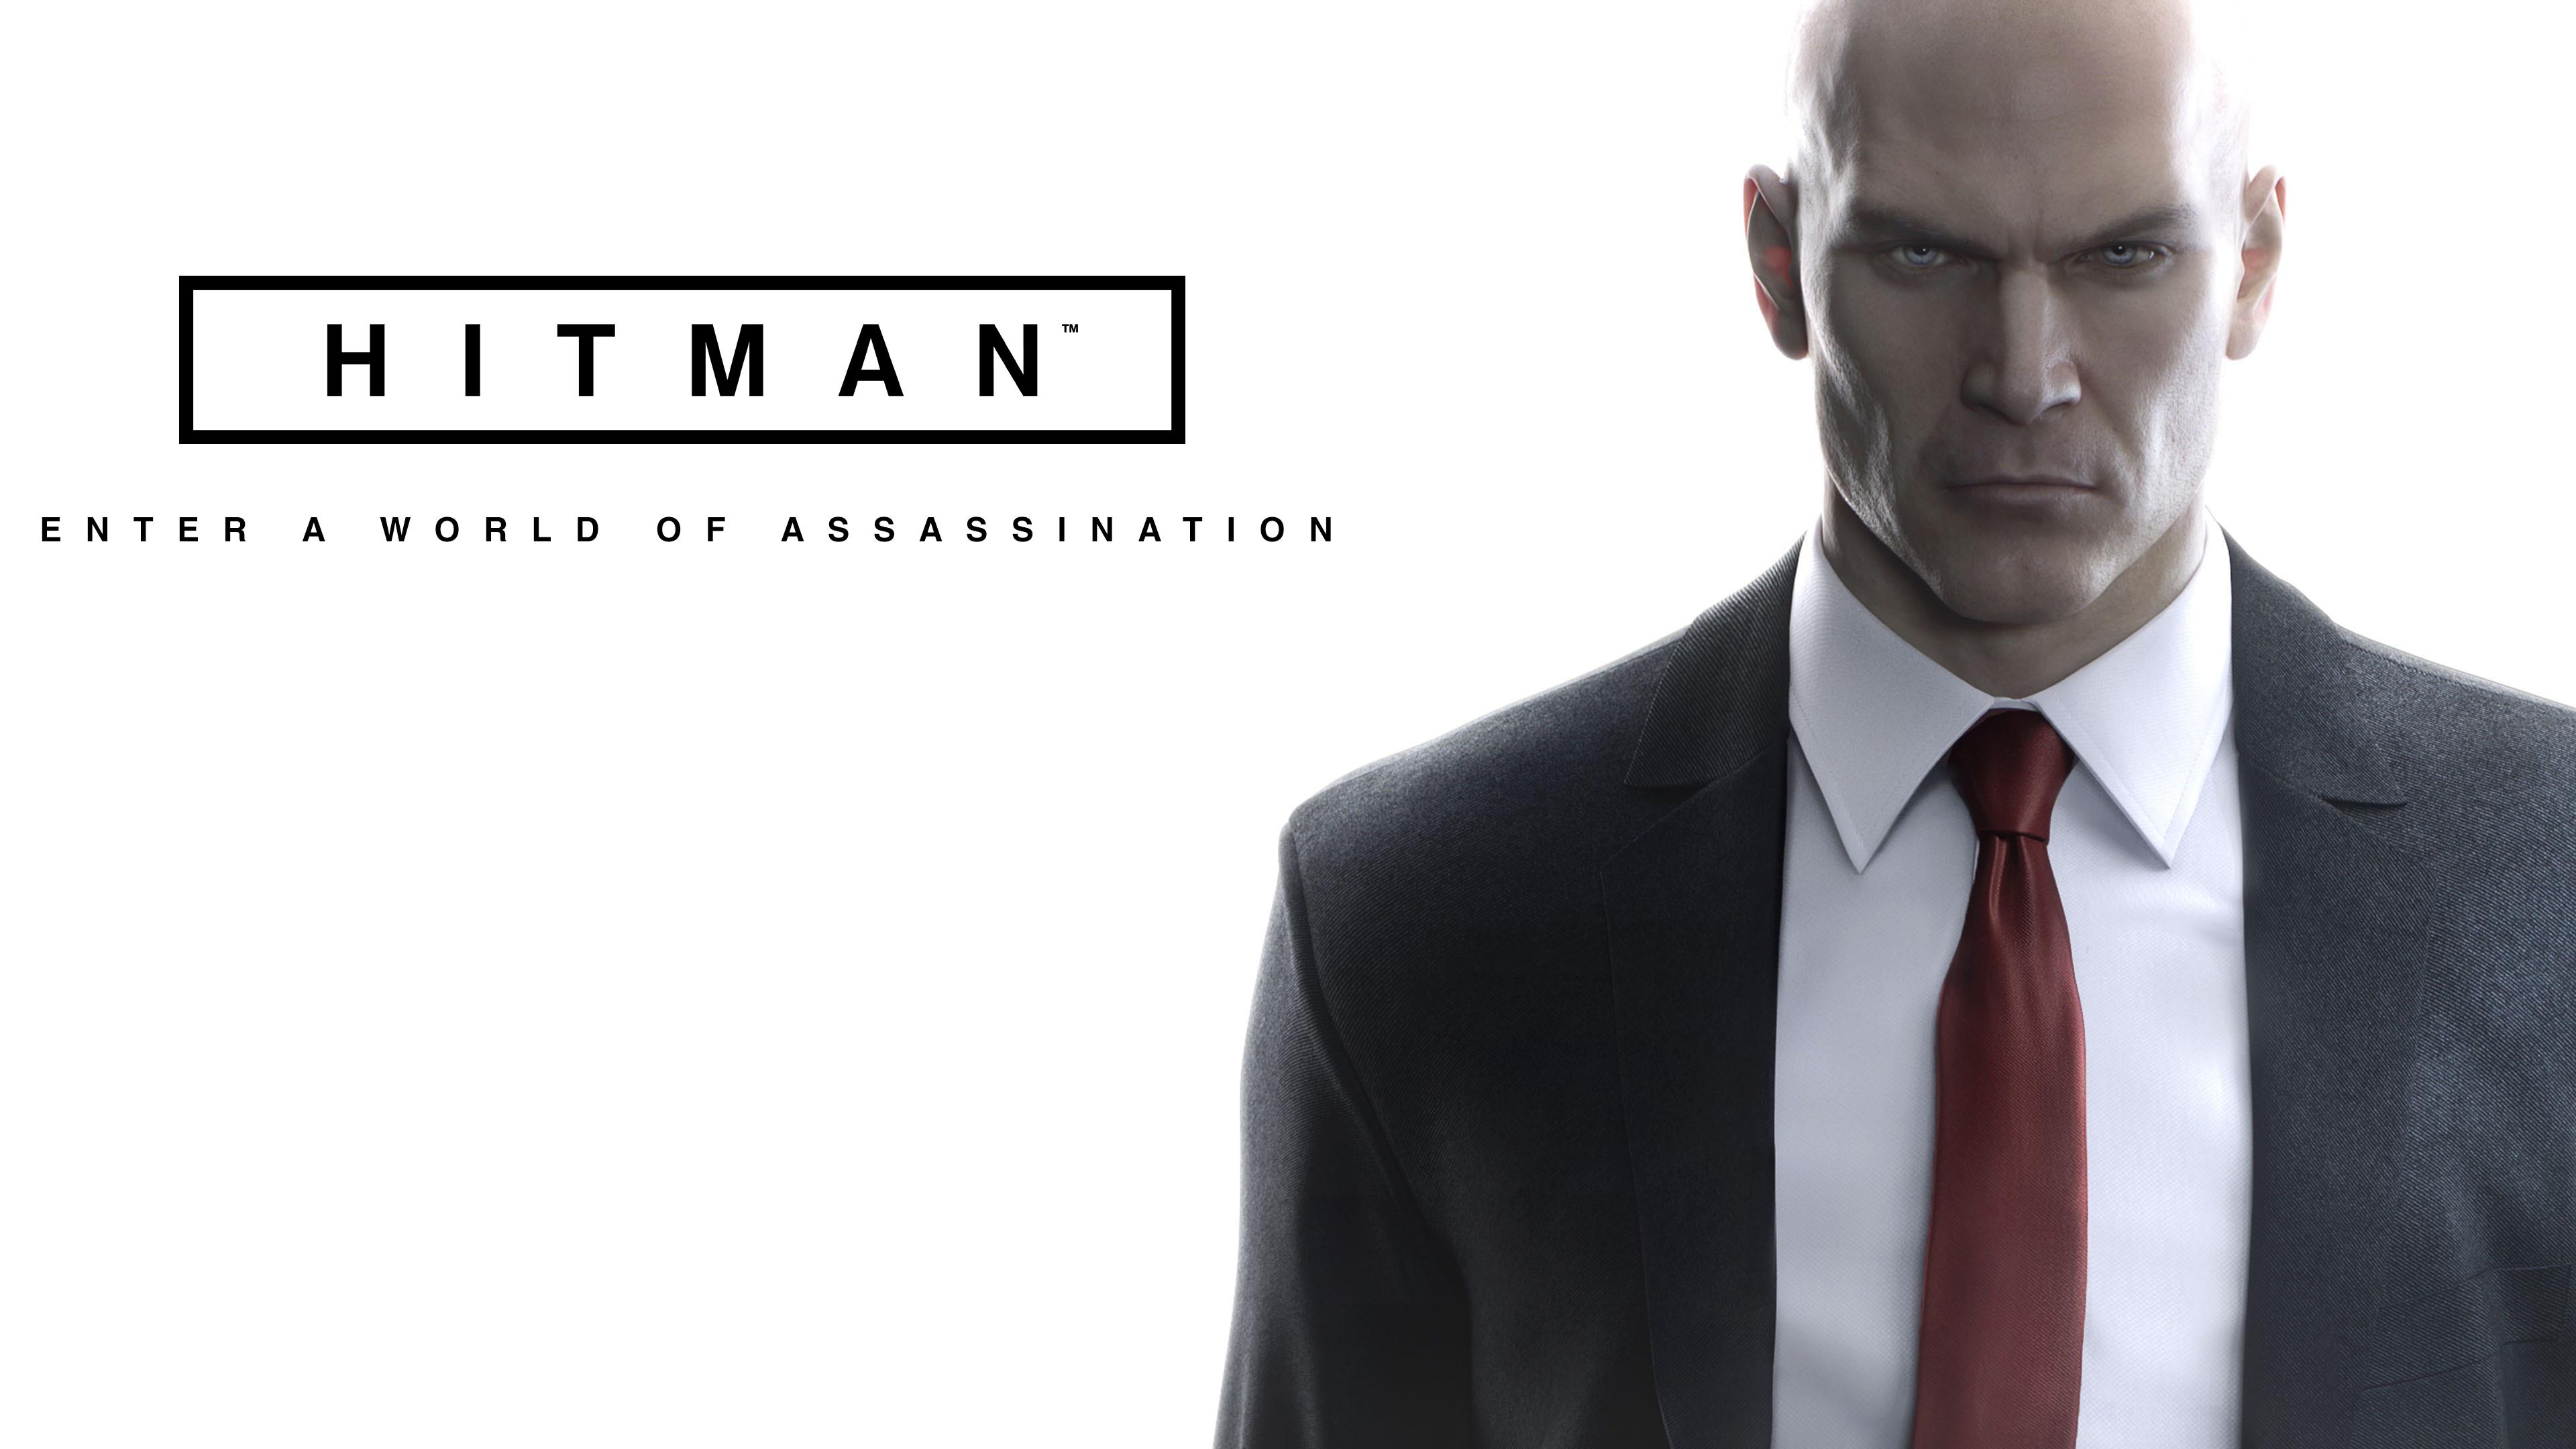 agent-47-hitman-2016-game-4k-3840x2160